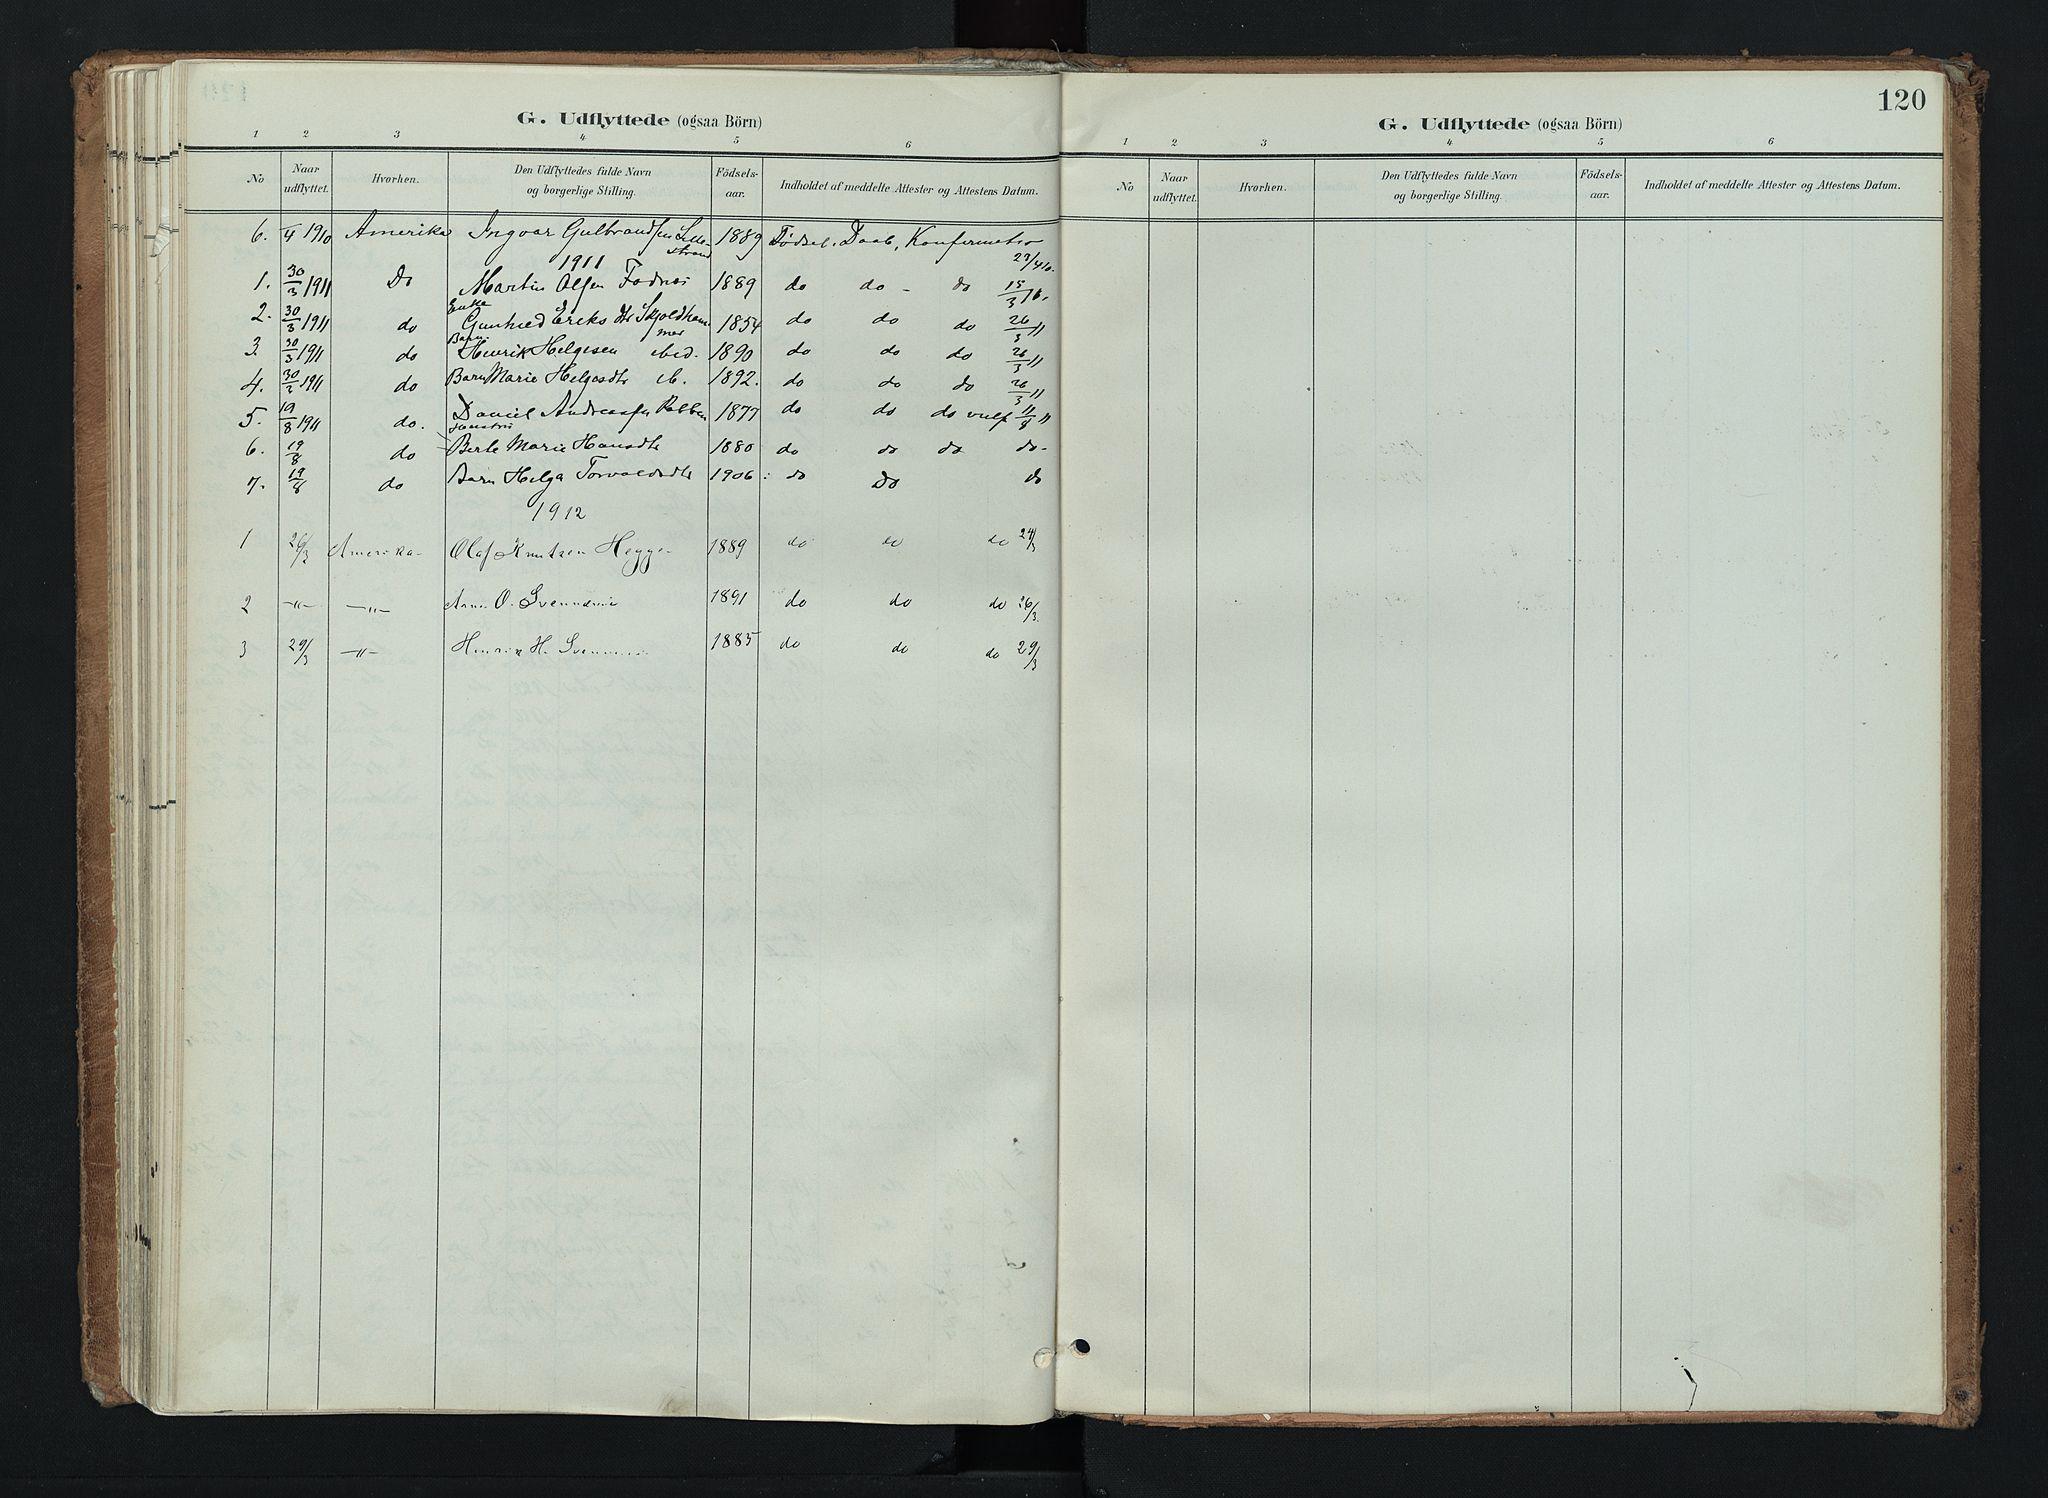 SAH, Nord-Aurdal prestekontor, Ministerialbok nr. 16, 1897-1925, s. 120